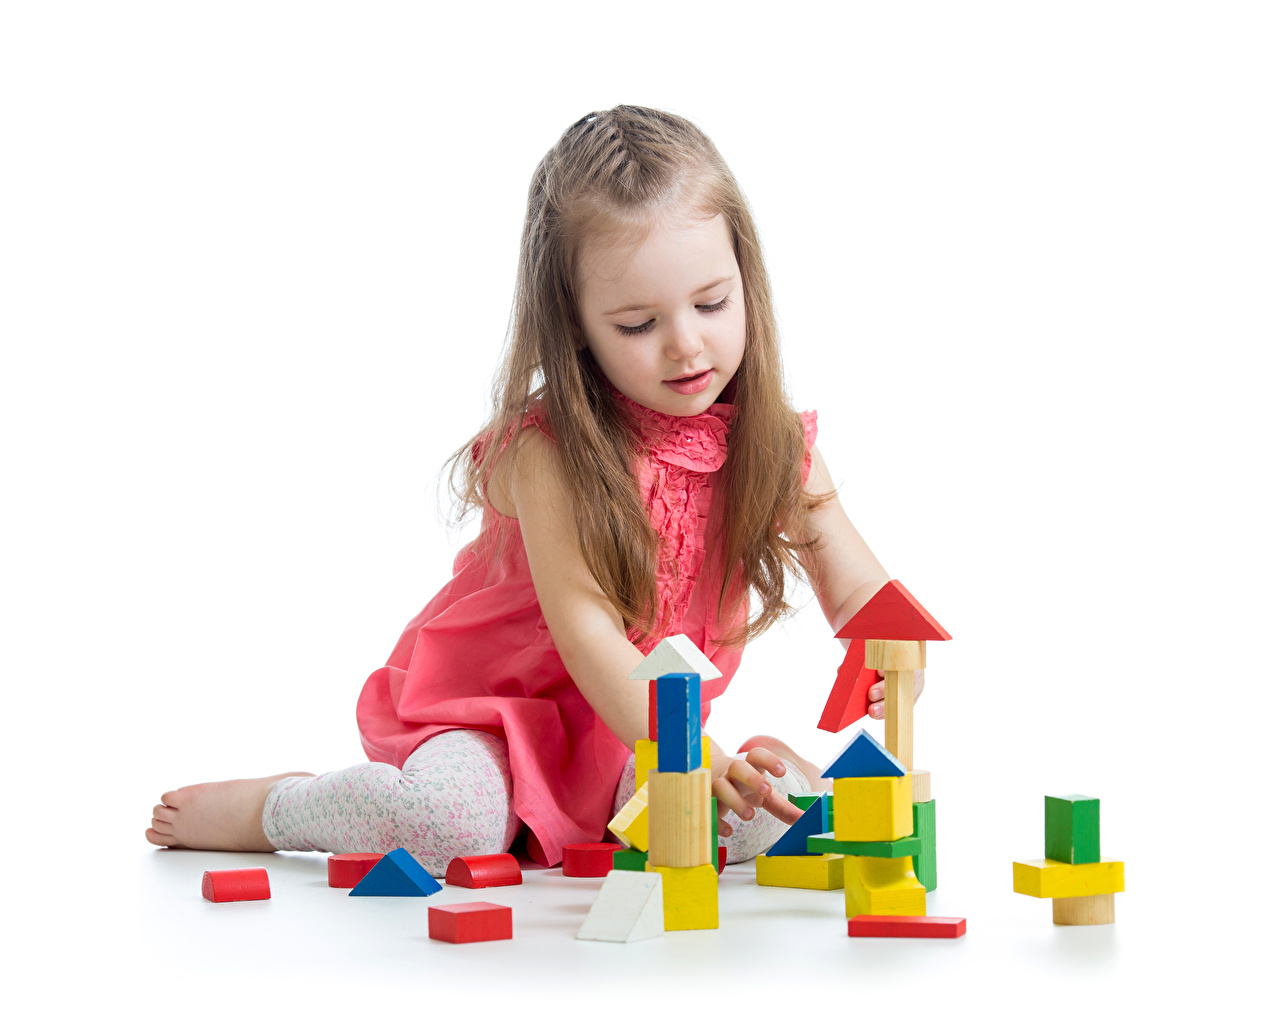 Photo Little girls Children Toys White background